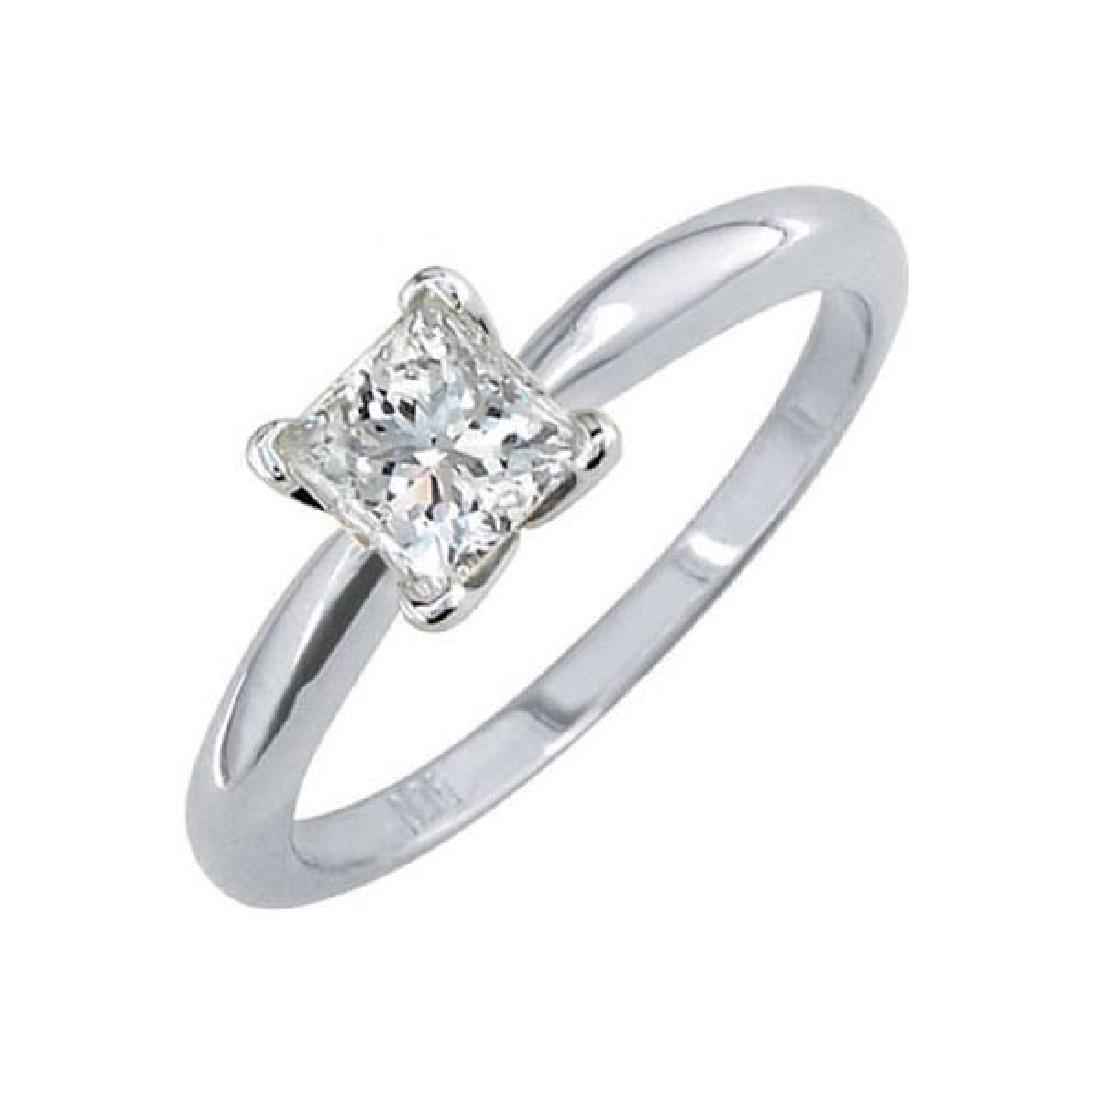 Certified 0.53 CTW Princess Diamond Solitaire 14k Ring